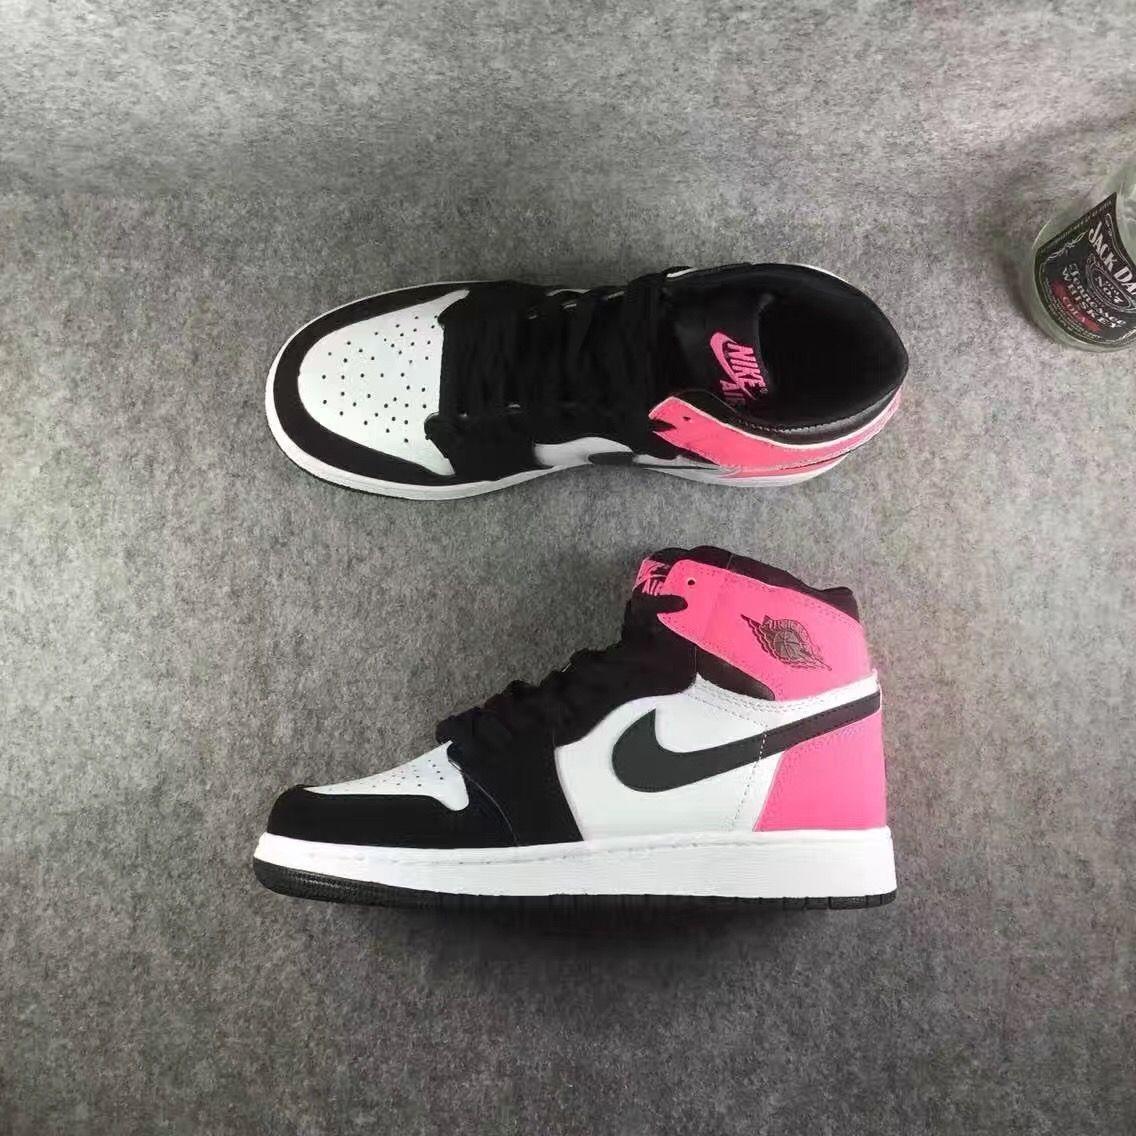 6cb1b48cf54f ... Nike Air Jordan 1 RETRO HIGH OG GS  Valentine s Day    SUPCLUB High  Street ...